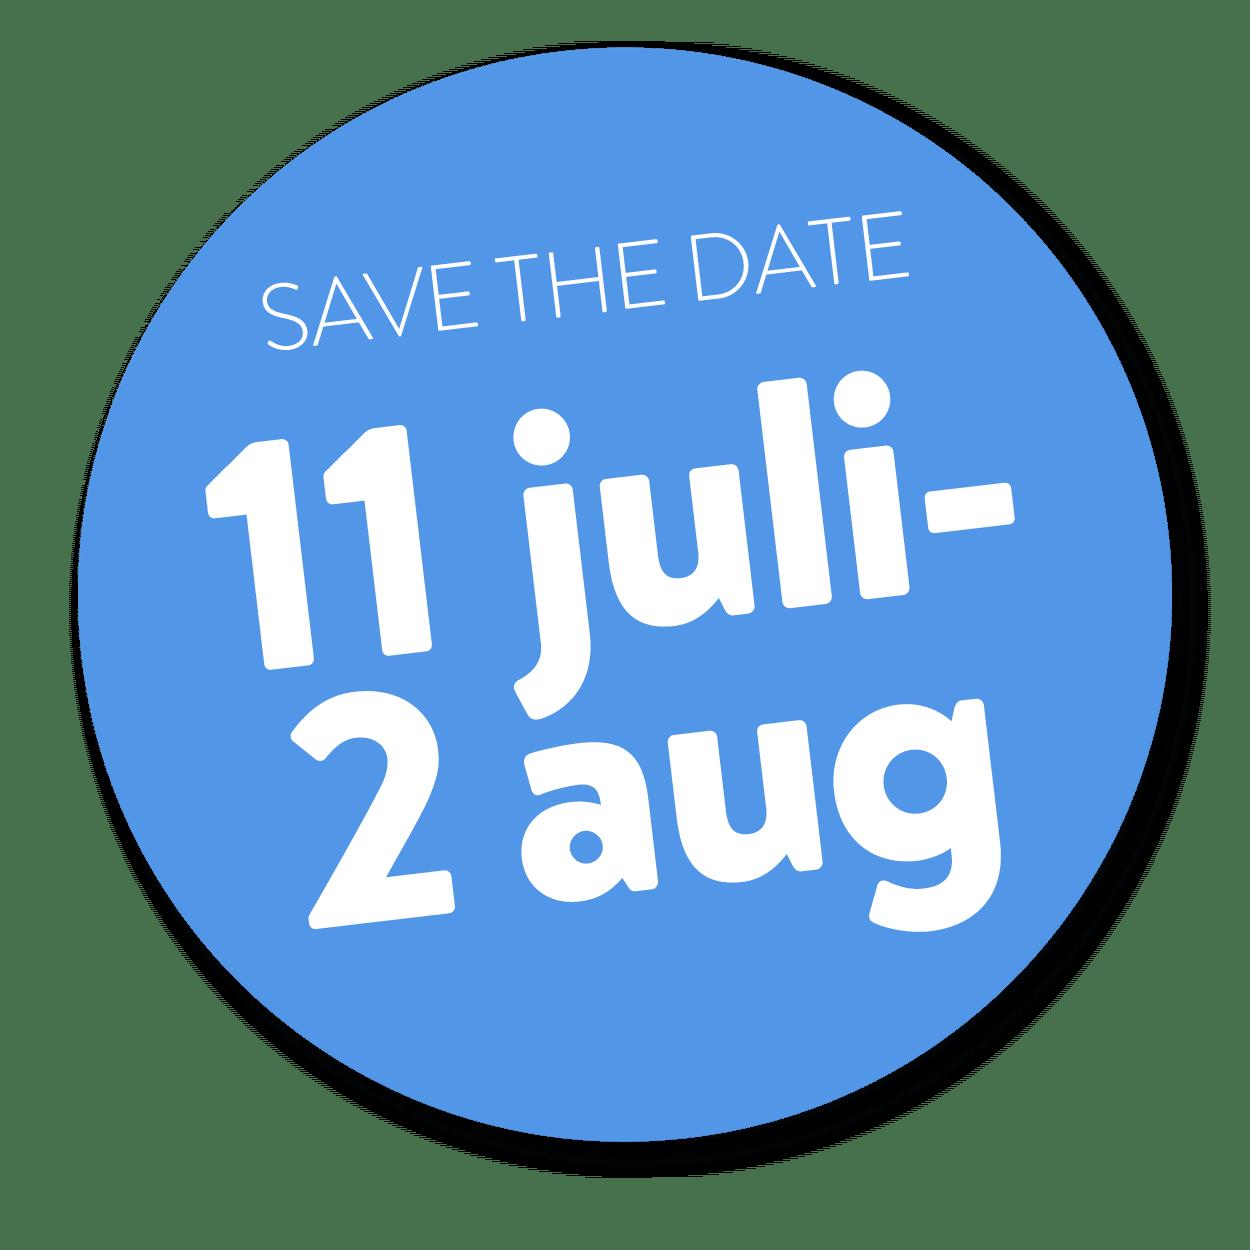 save the date 11 juli - 2 augusti